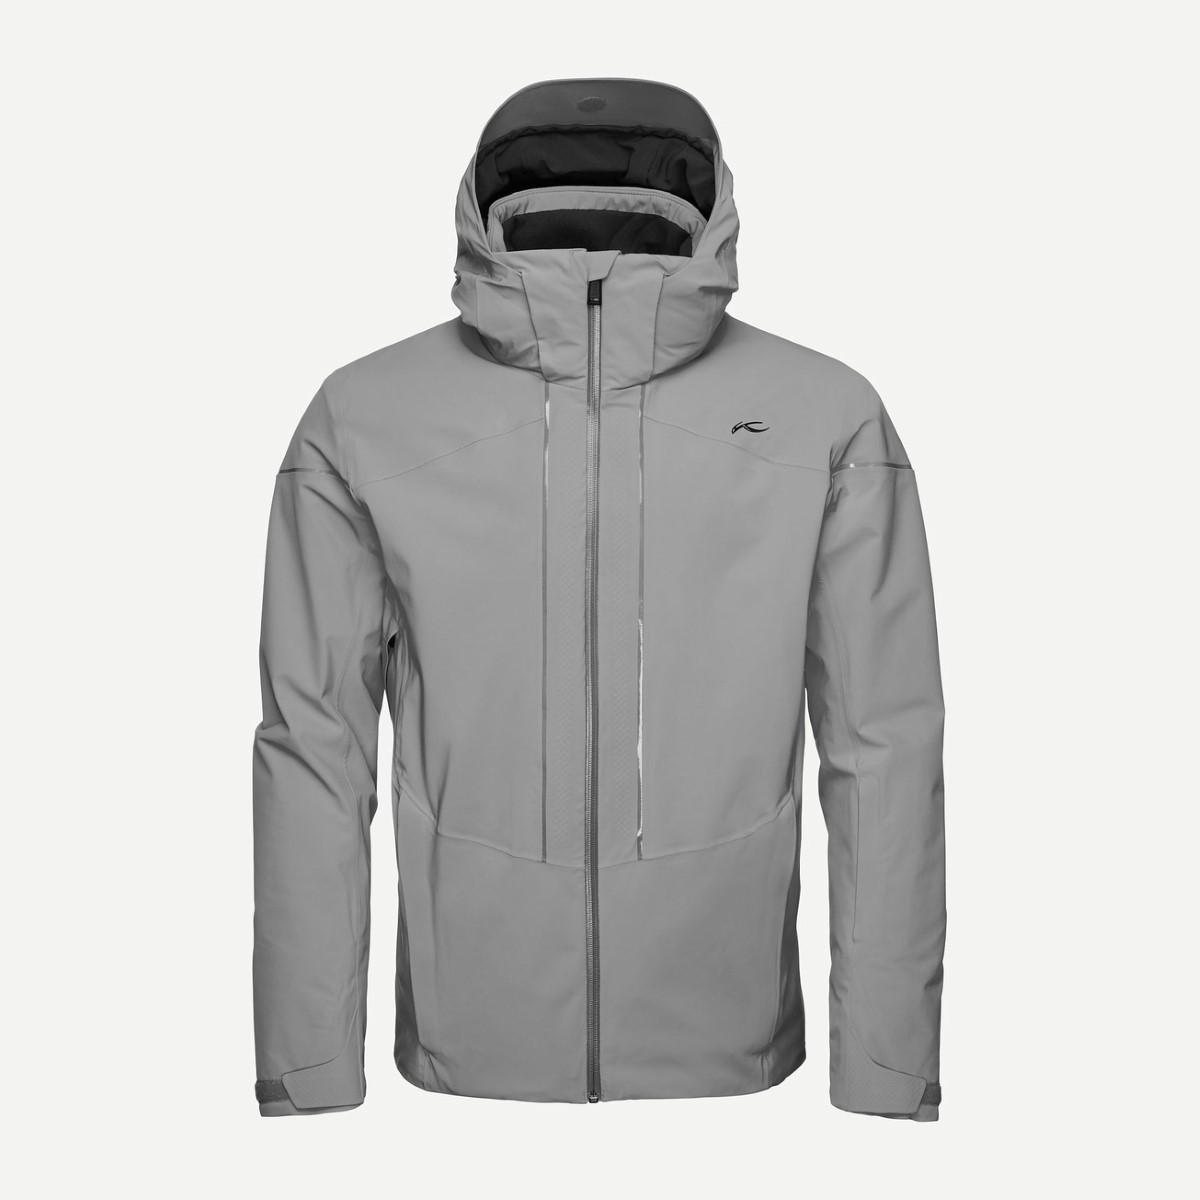 Kjus M Sight Line Jacket